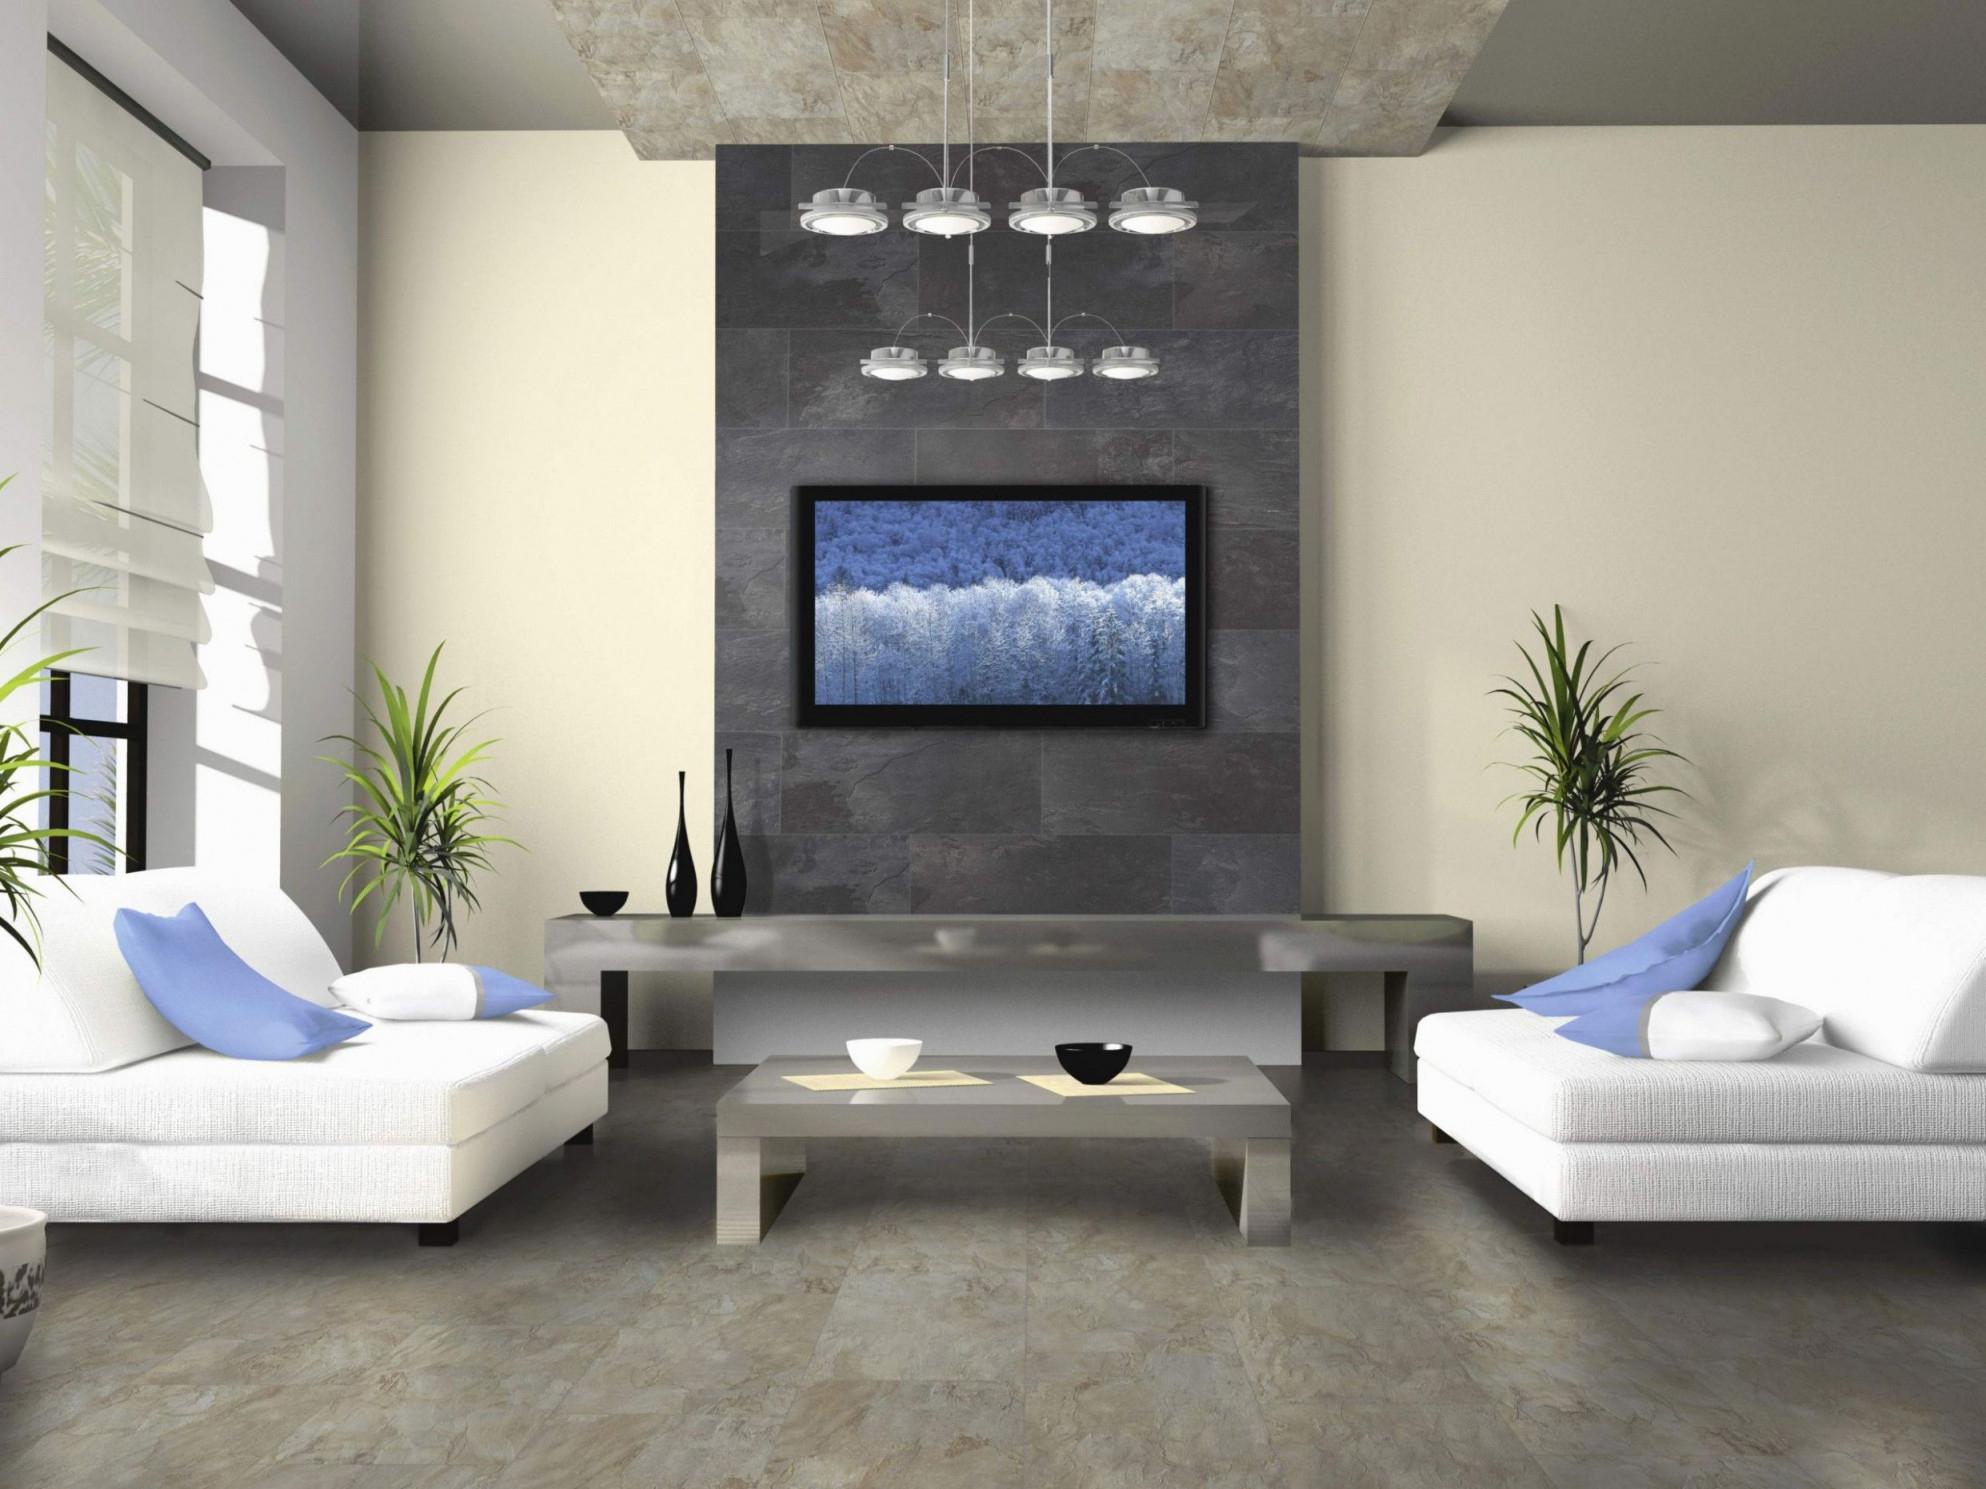 14 Lebensräume Moderne Gestalten In 2020  Deko Wohnzimmer von Wohnzimmer Modern Gestalten Photo